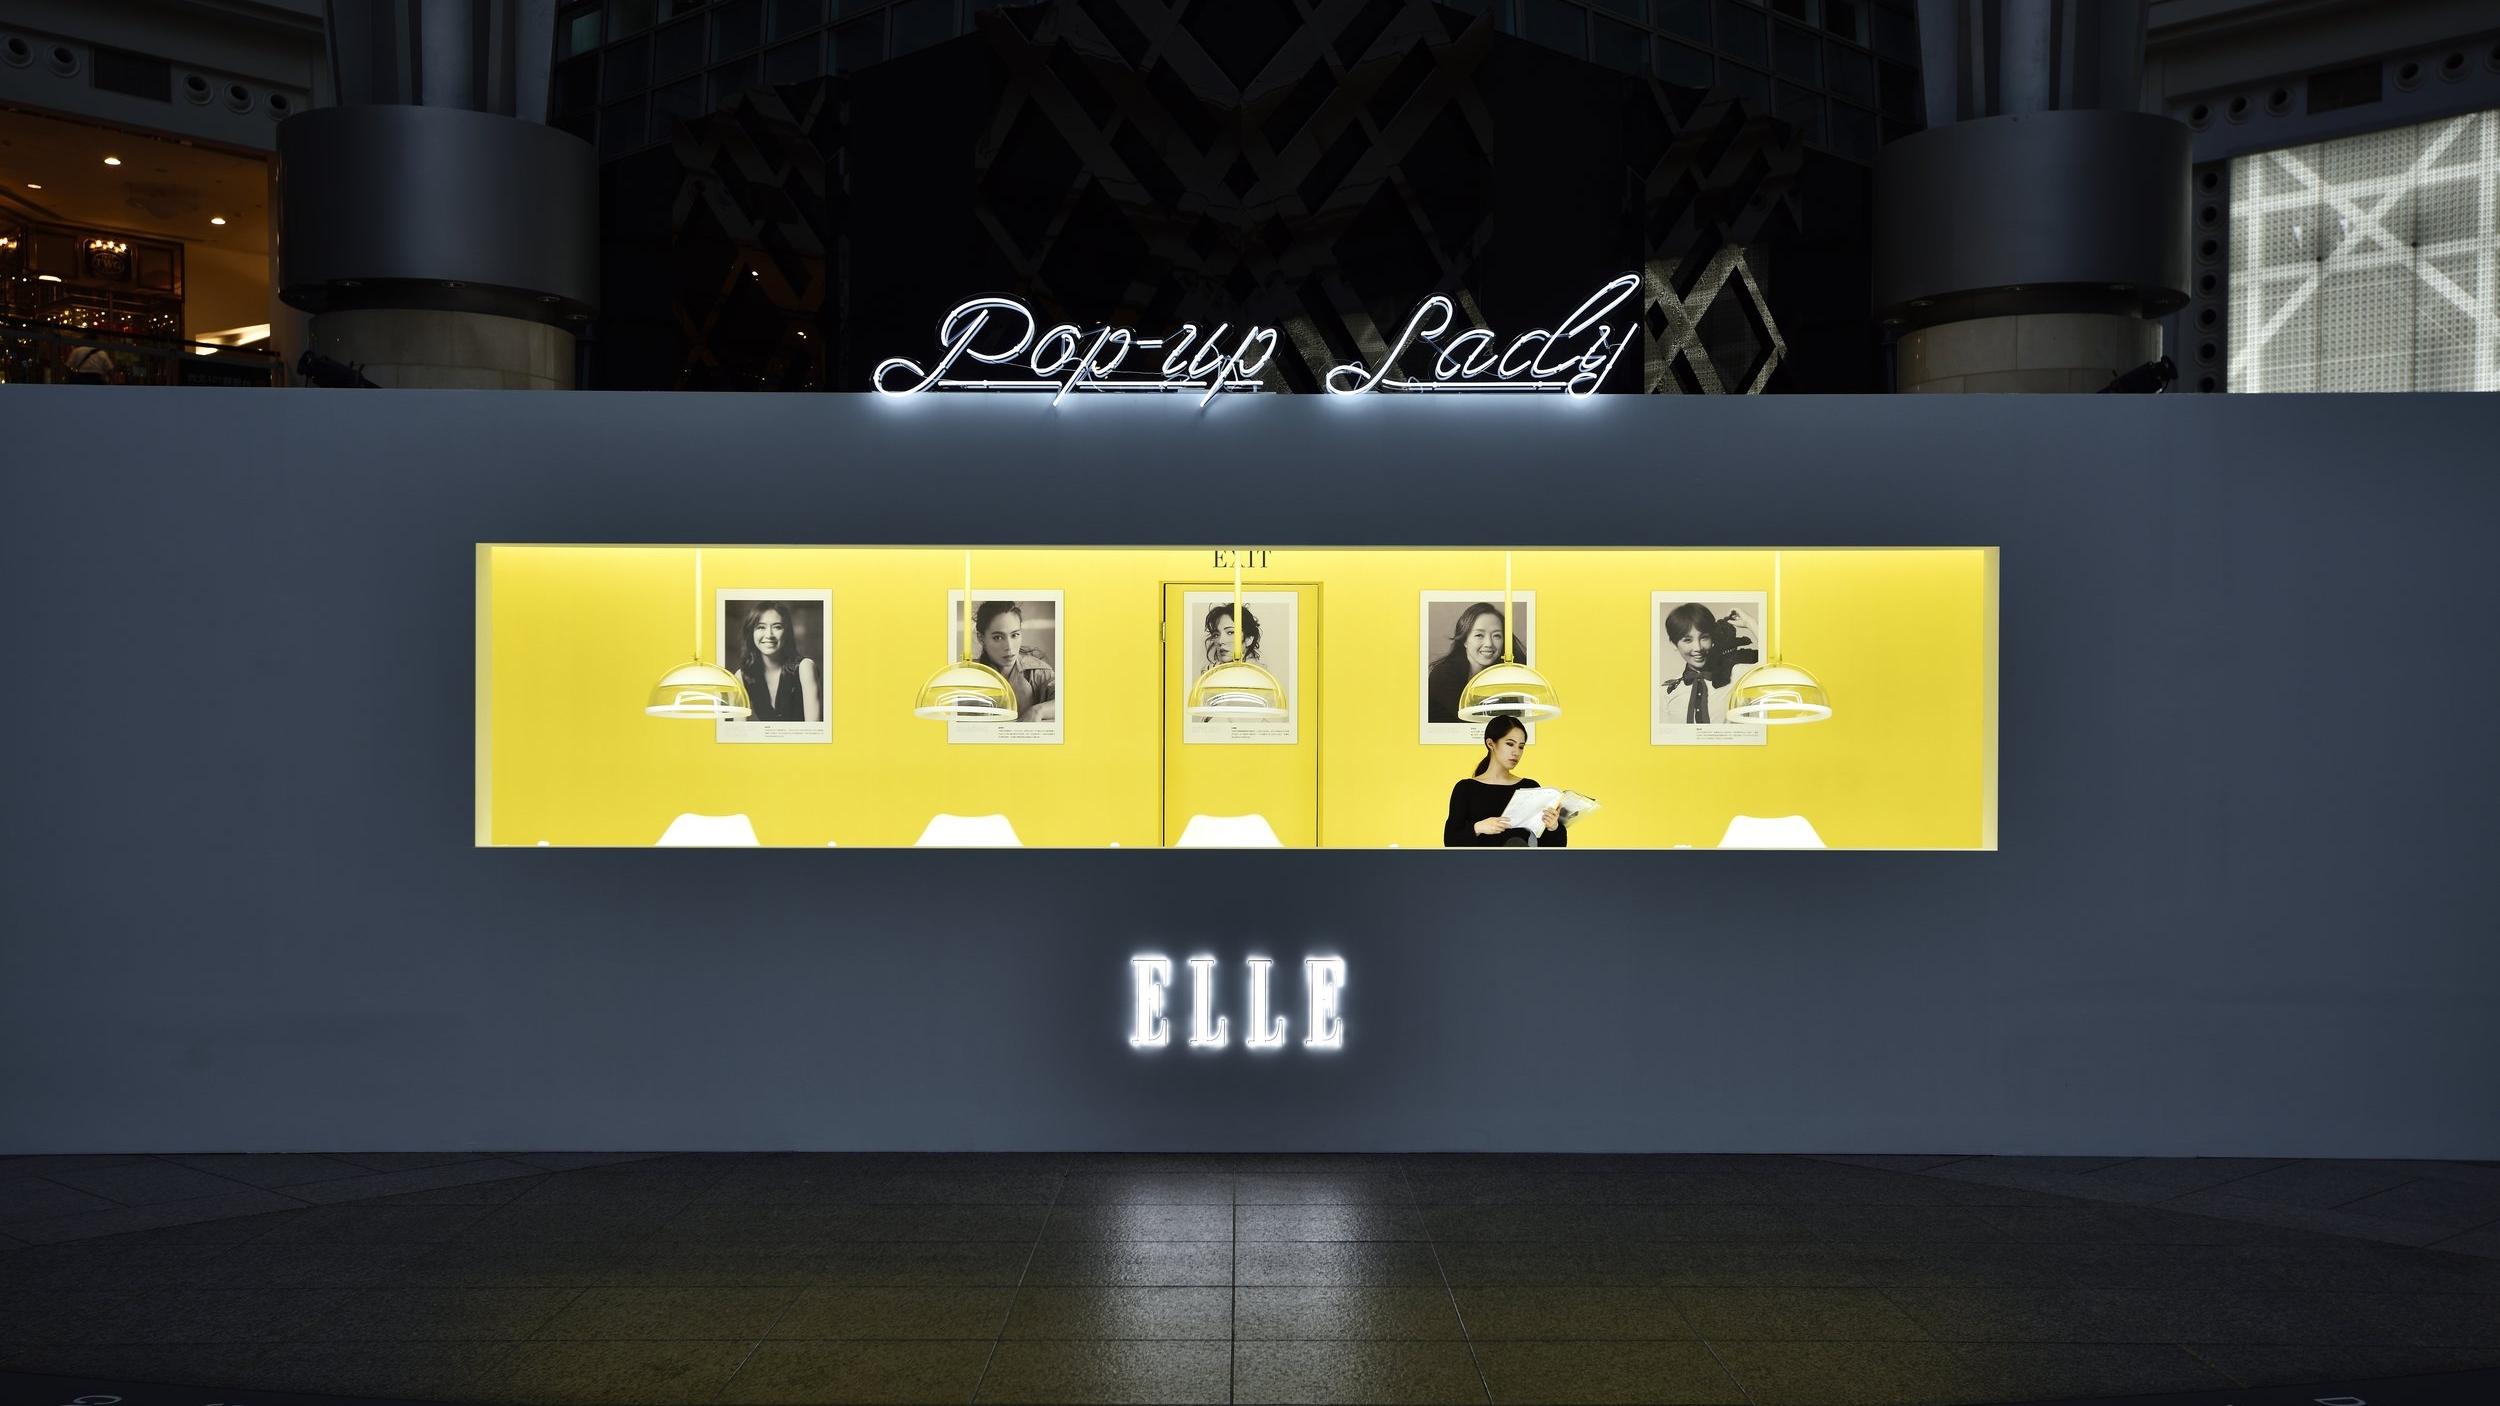 Pop-up Lady-ELLE-11.jpg